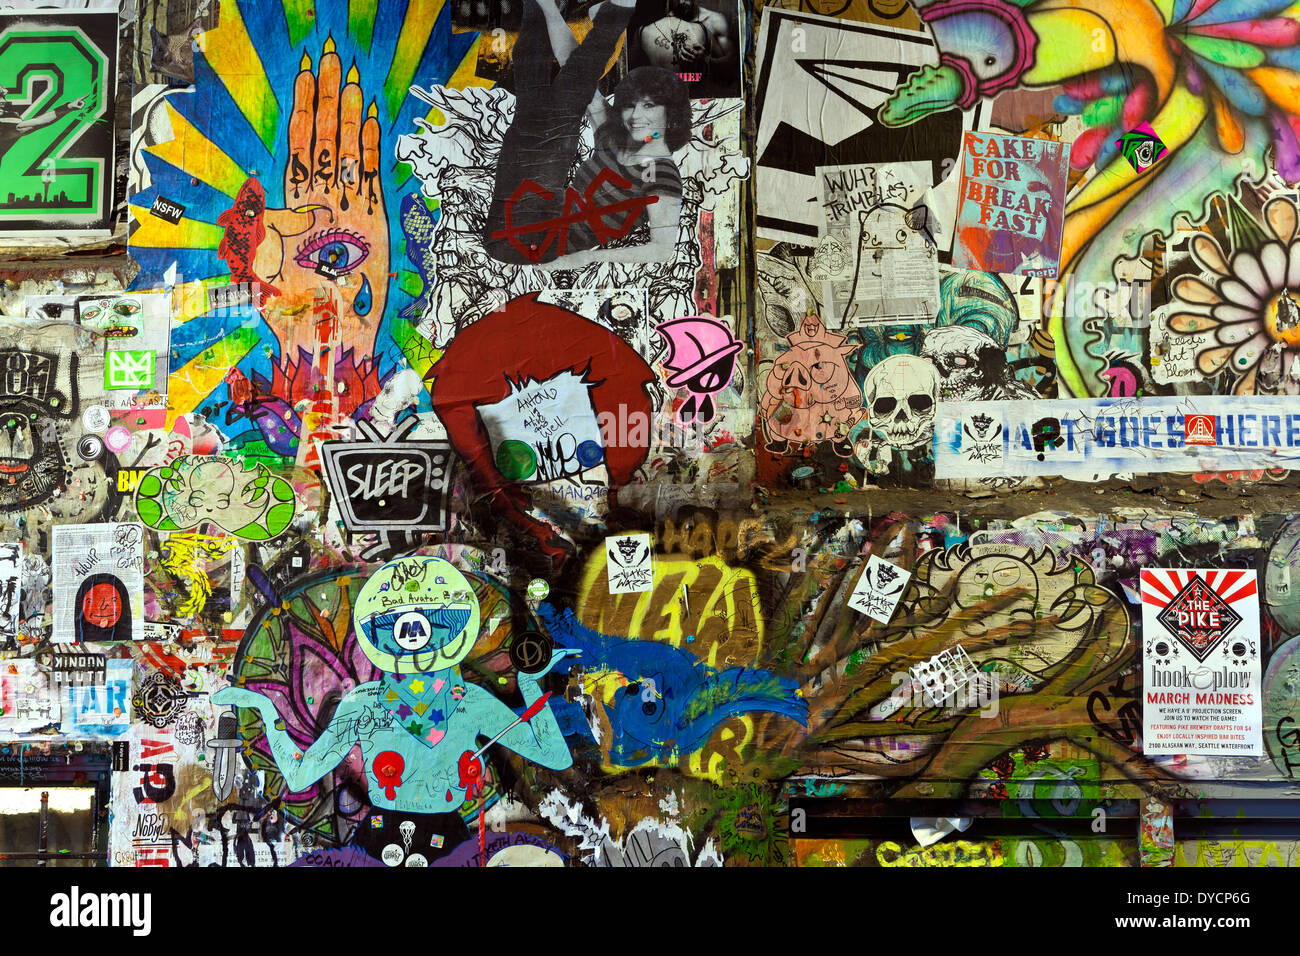 Graffiti wall ann arbor - Washington Graffiti Wall In Post Alley Of Seattle S Pike